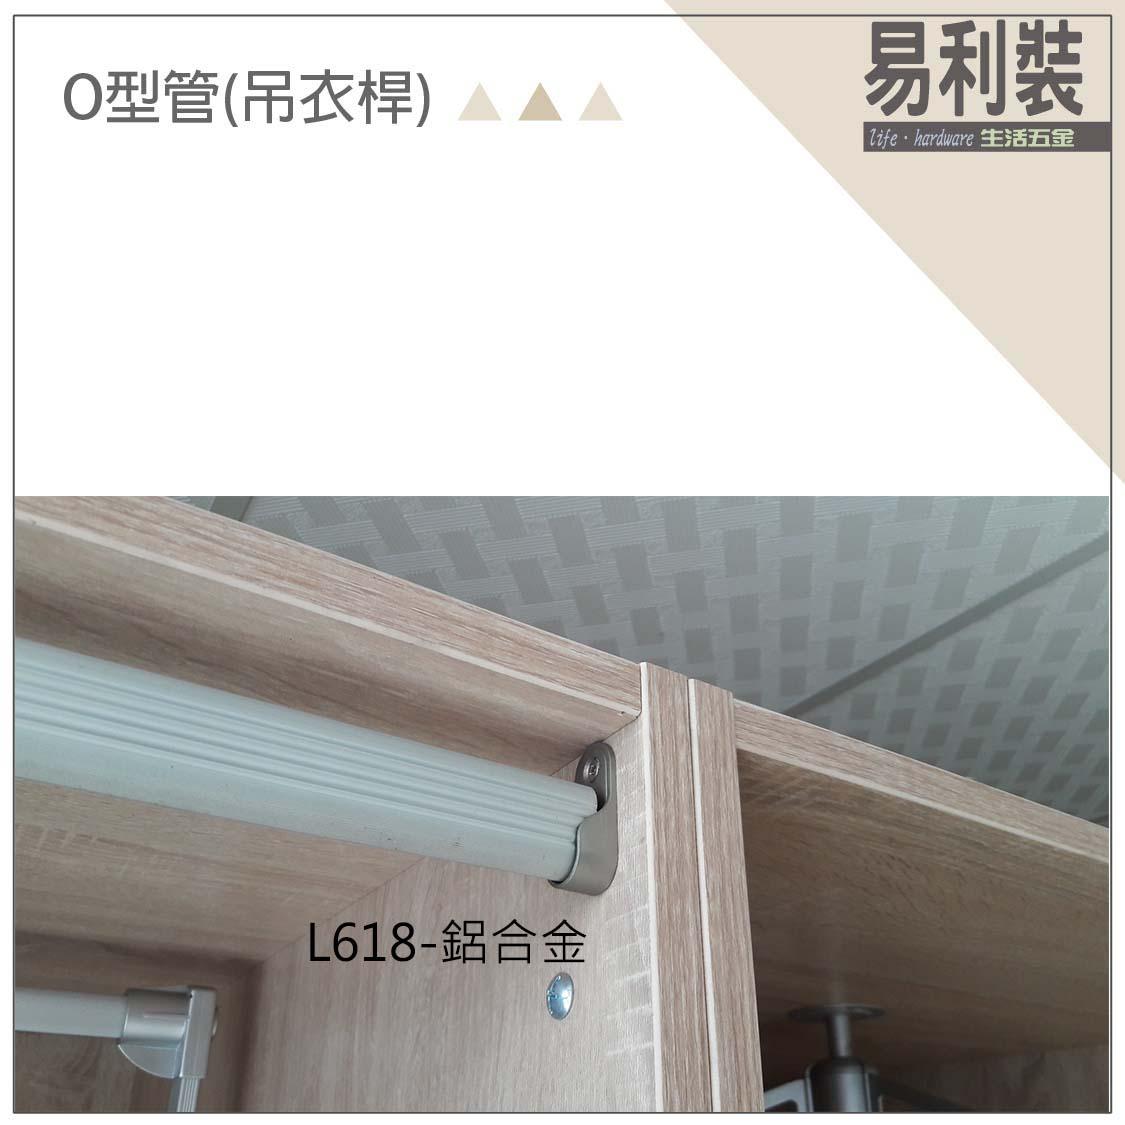 【 EASYCAN 】L618 O型管 易利裝生活五金 鋁合金 吊衣桿 房間 臥房 客廳 餐廳 櫥櫃 衣櫃 小資族 辦公家具 系統家具